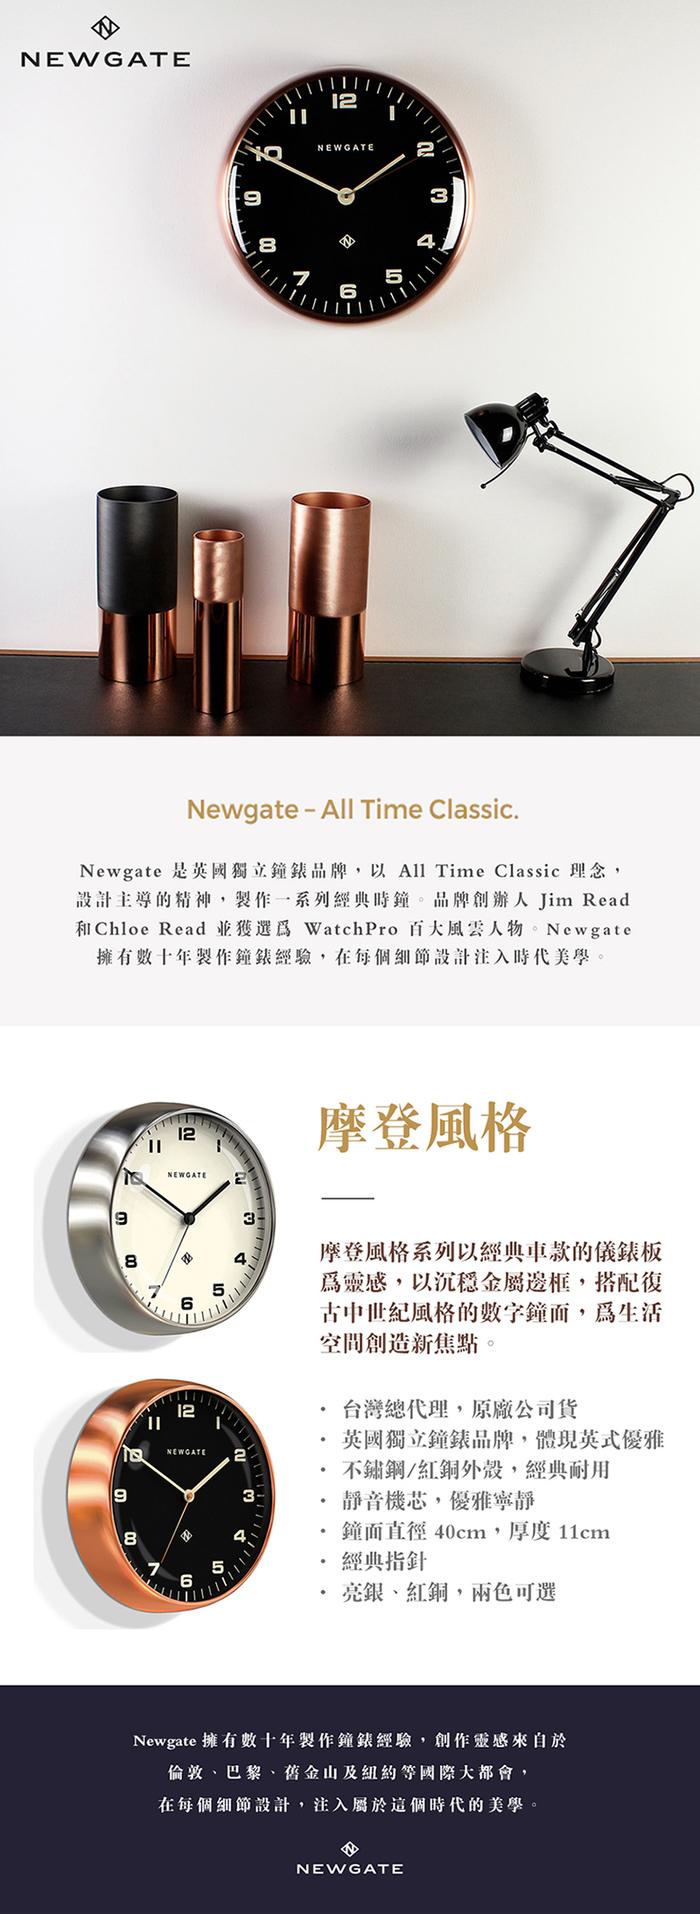 Newgate | 英倫風格時鐘-摩登風格-亮銀-40cm